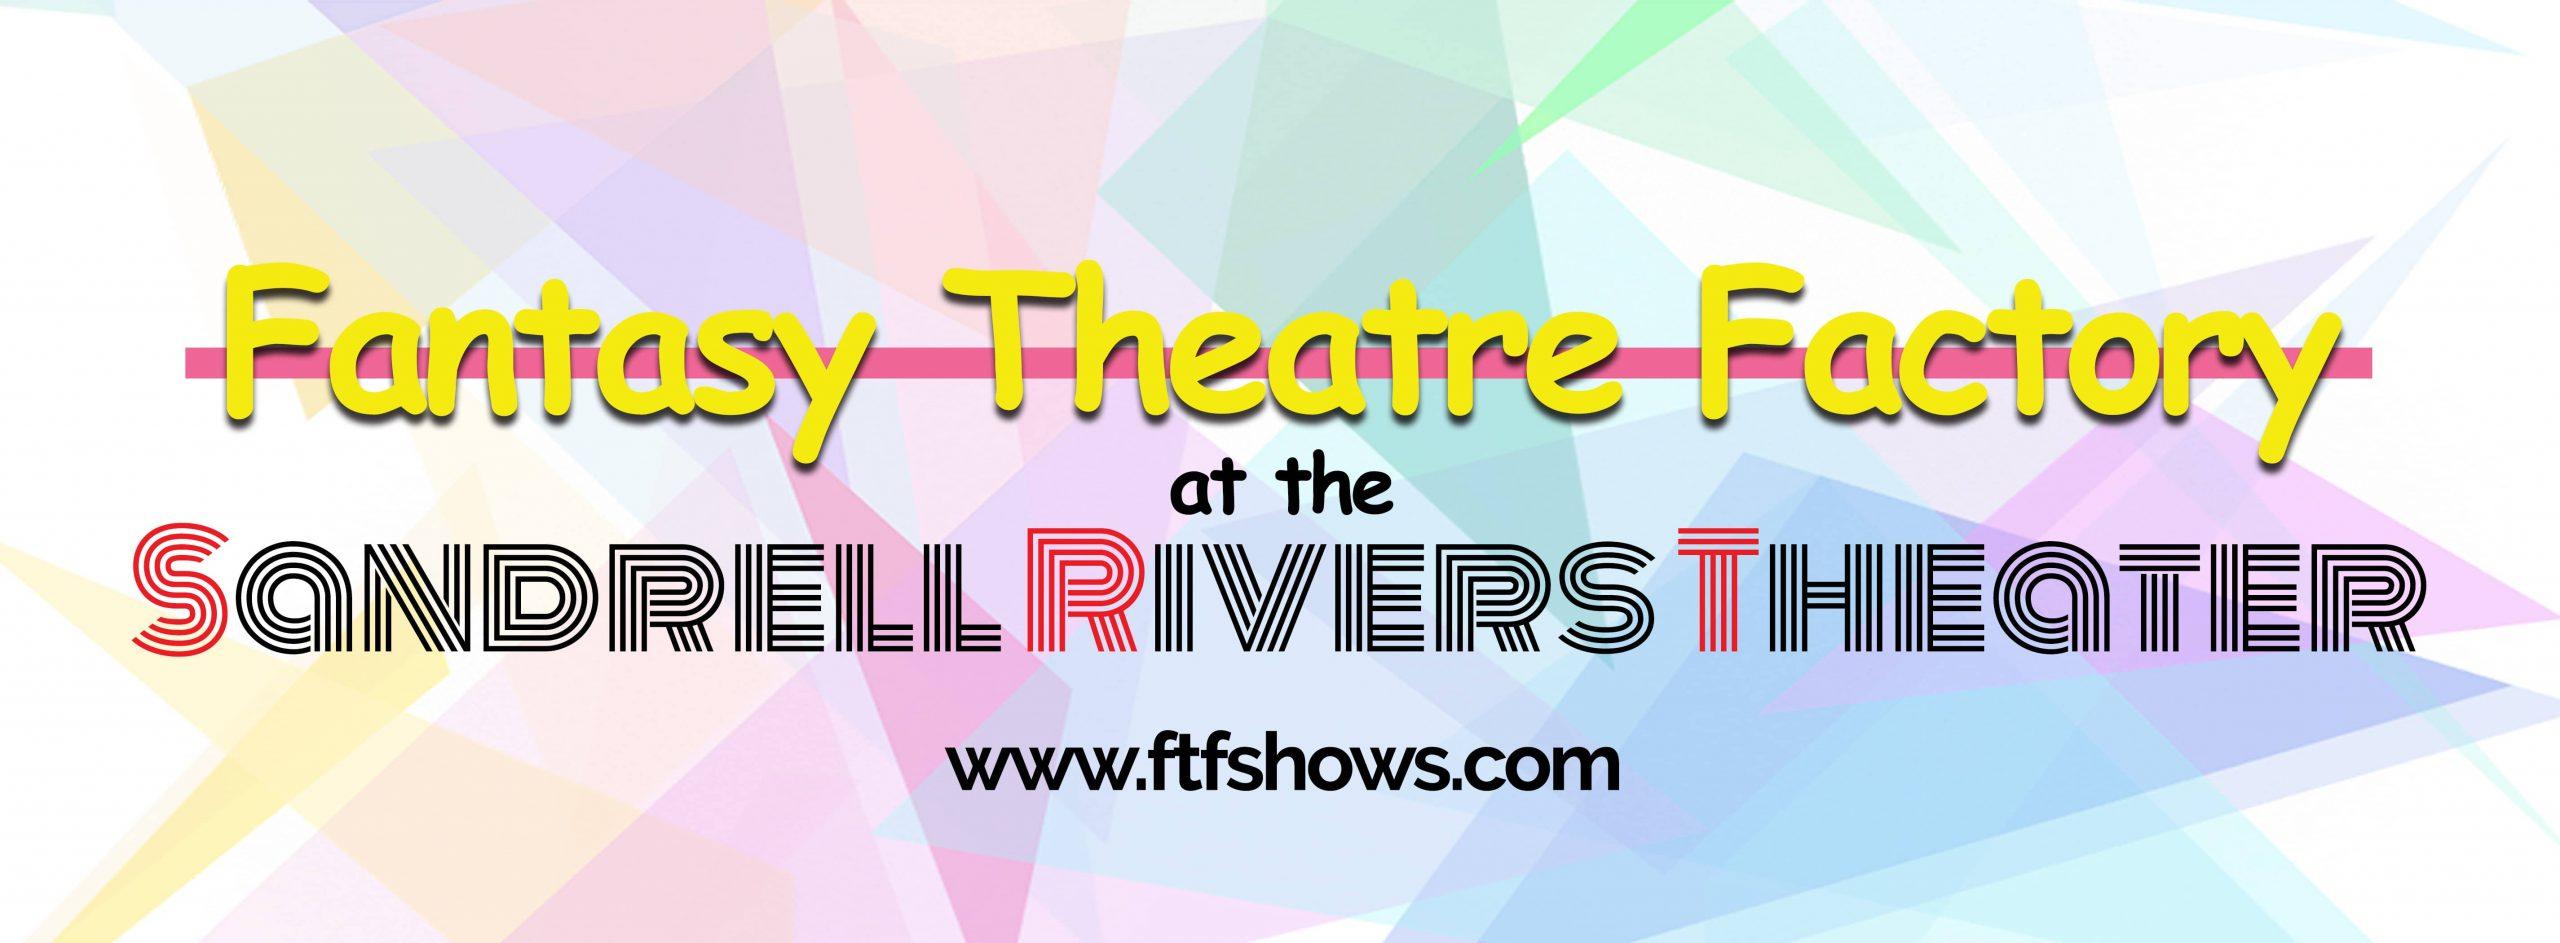 Fantasy Theatre Factory Inc.